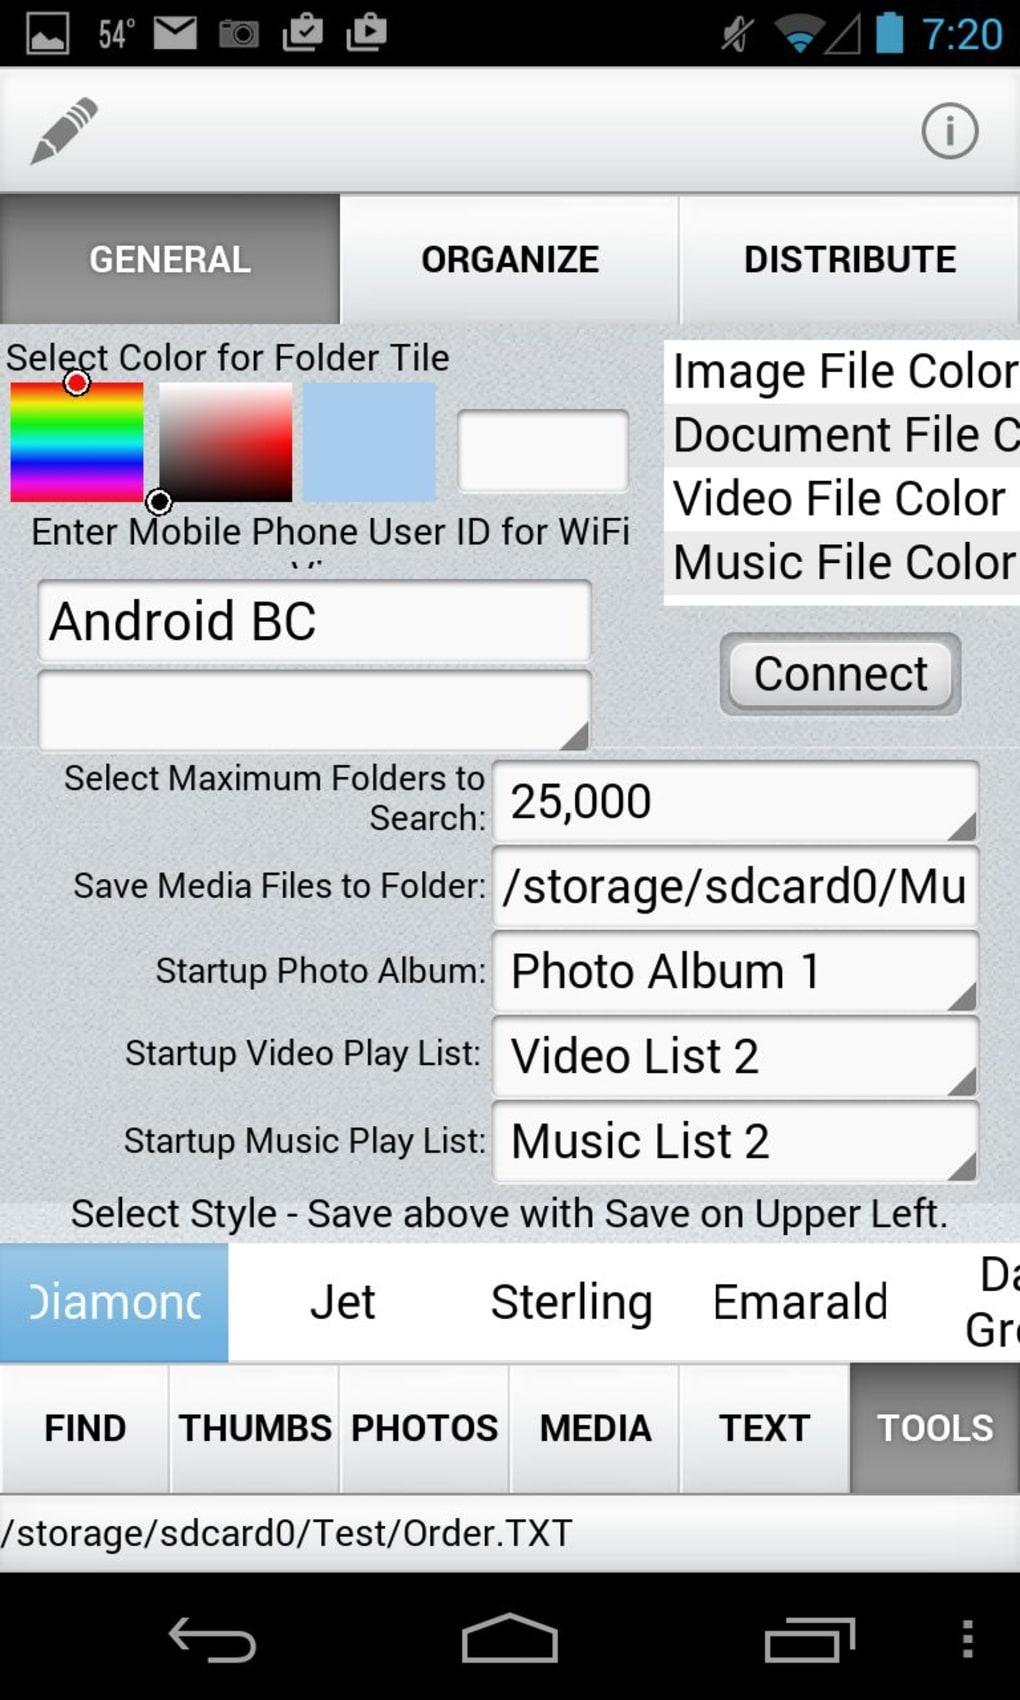 express files free download for windows 7 64 bit